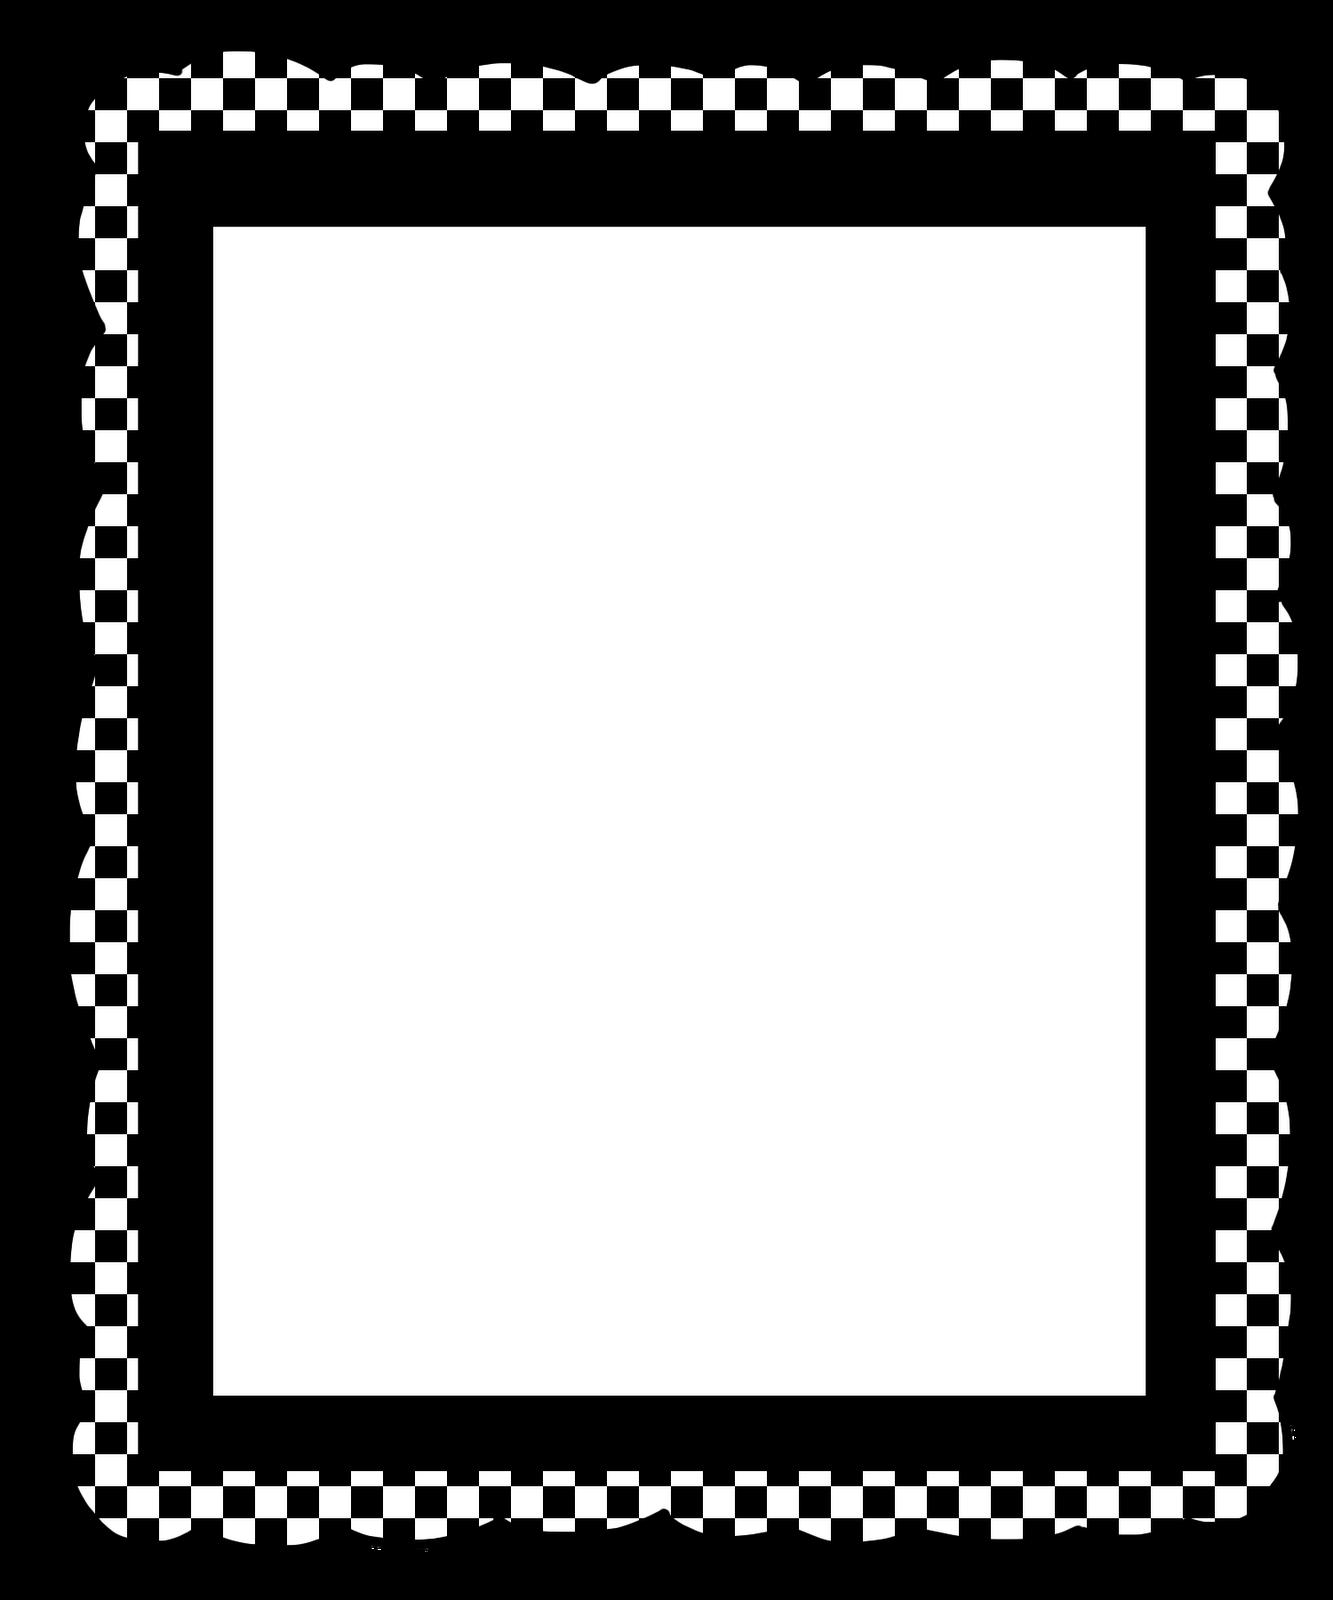 Free Borders Border Clip Art Free Animations Clipart - HD1333×1600